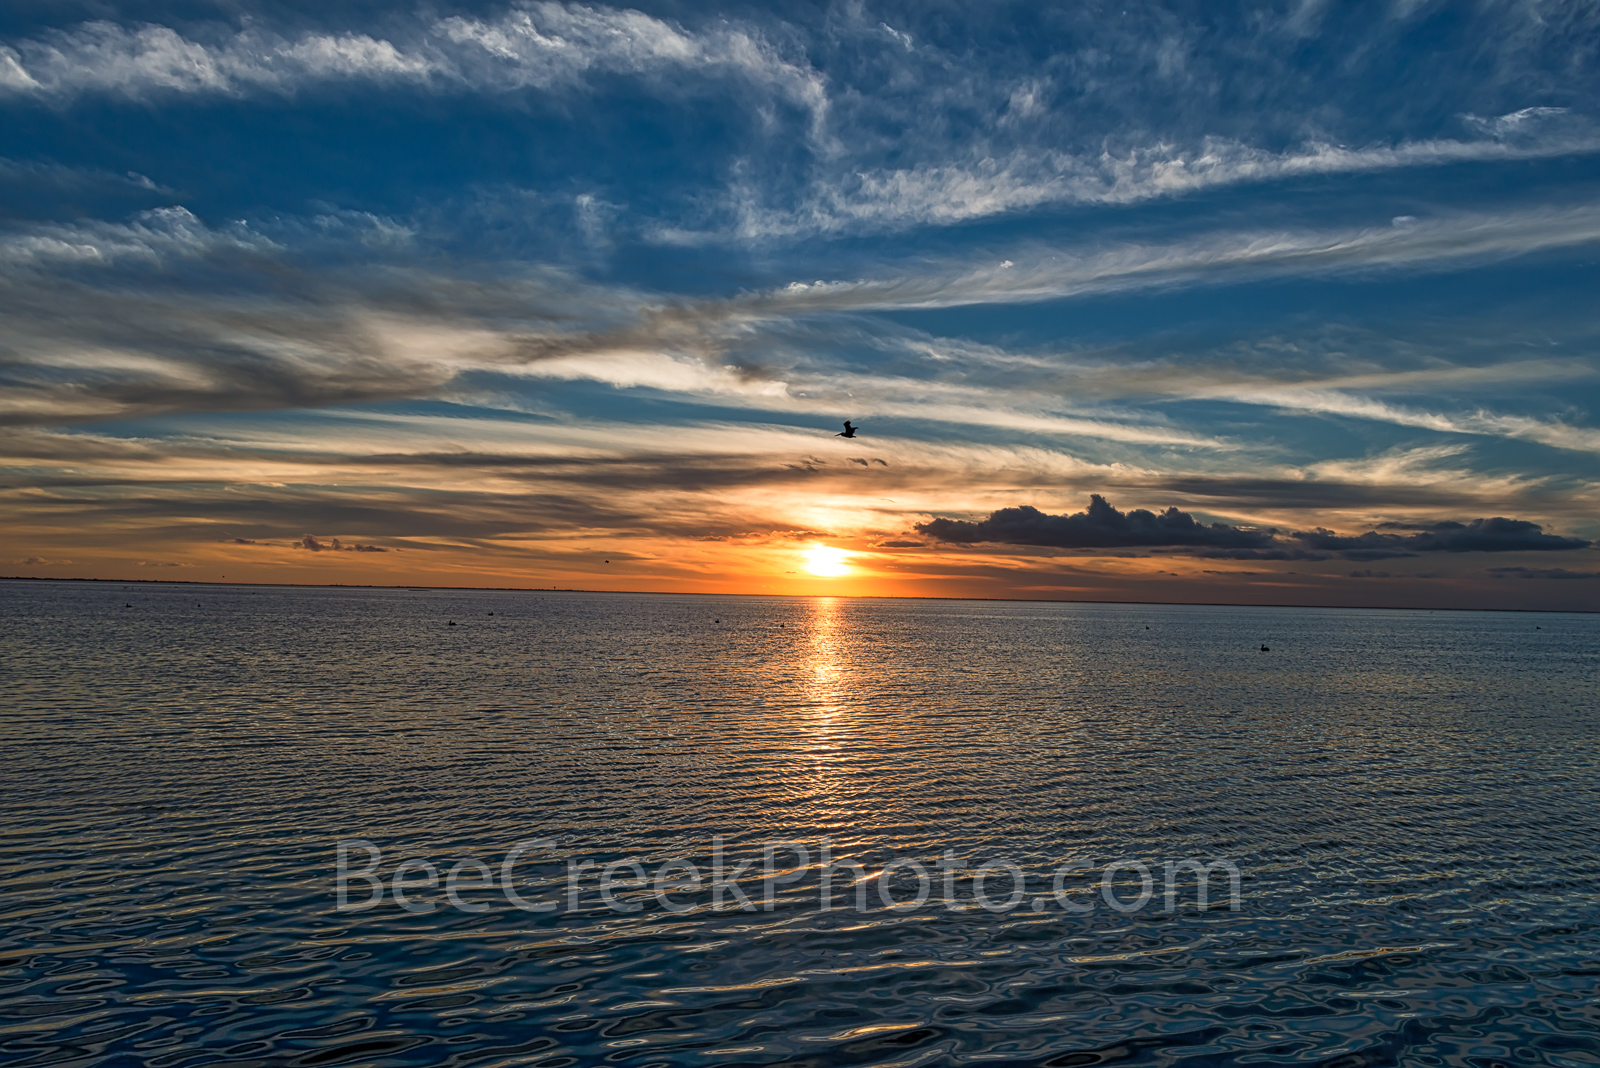 gulf coast, texas beach, birds, island, padre island, south padre bay sunset, south padre island, sunset, bay, nature, pelican, bird, water, coast, Texas landscape, coastal, Texas coastal landscape,gu, photo